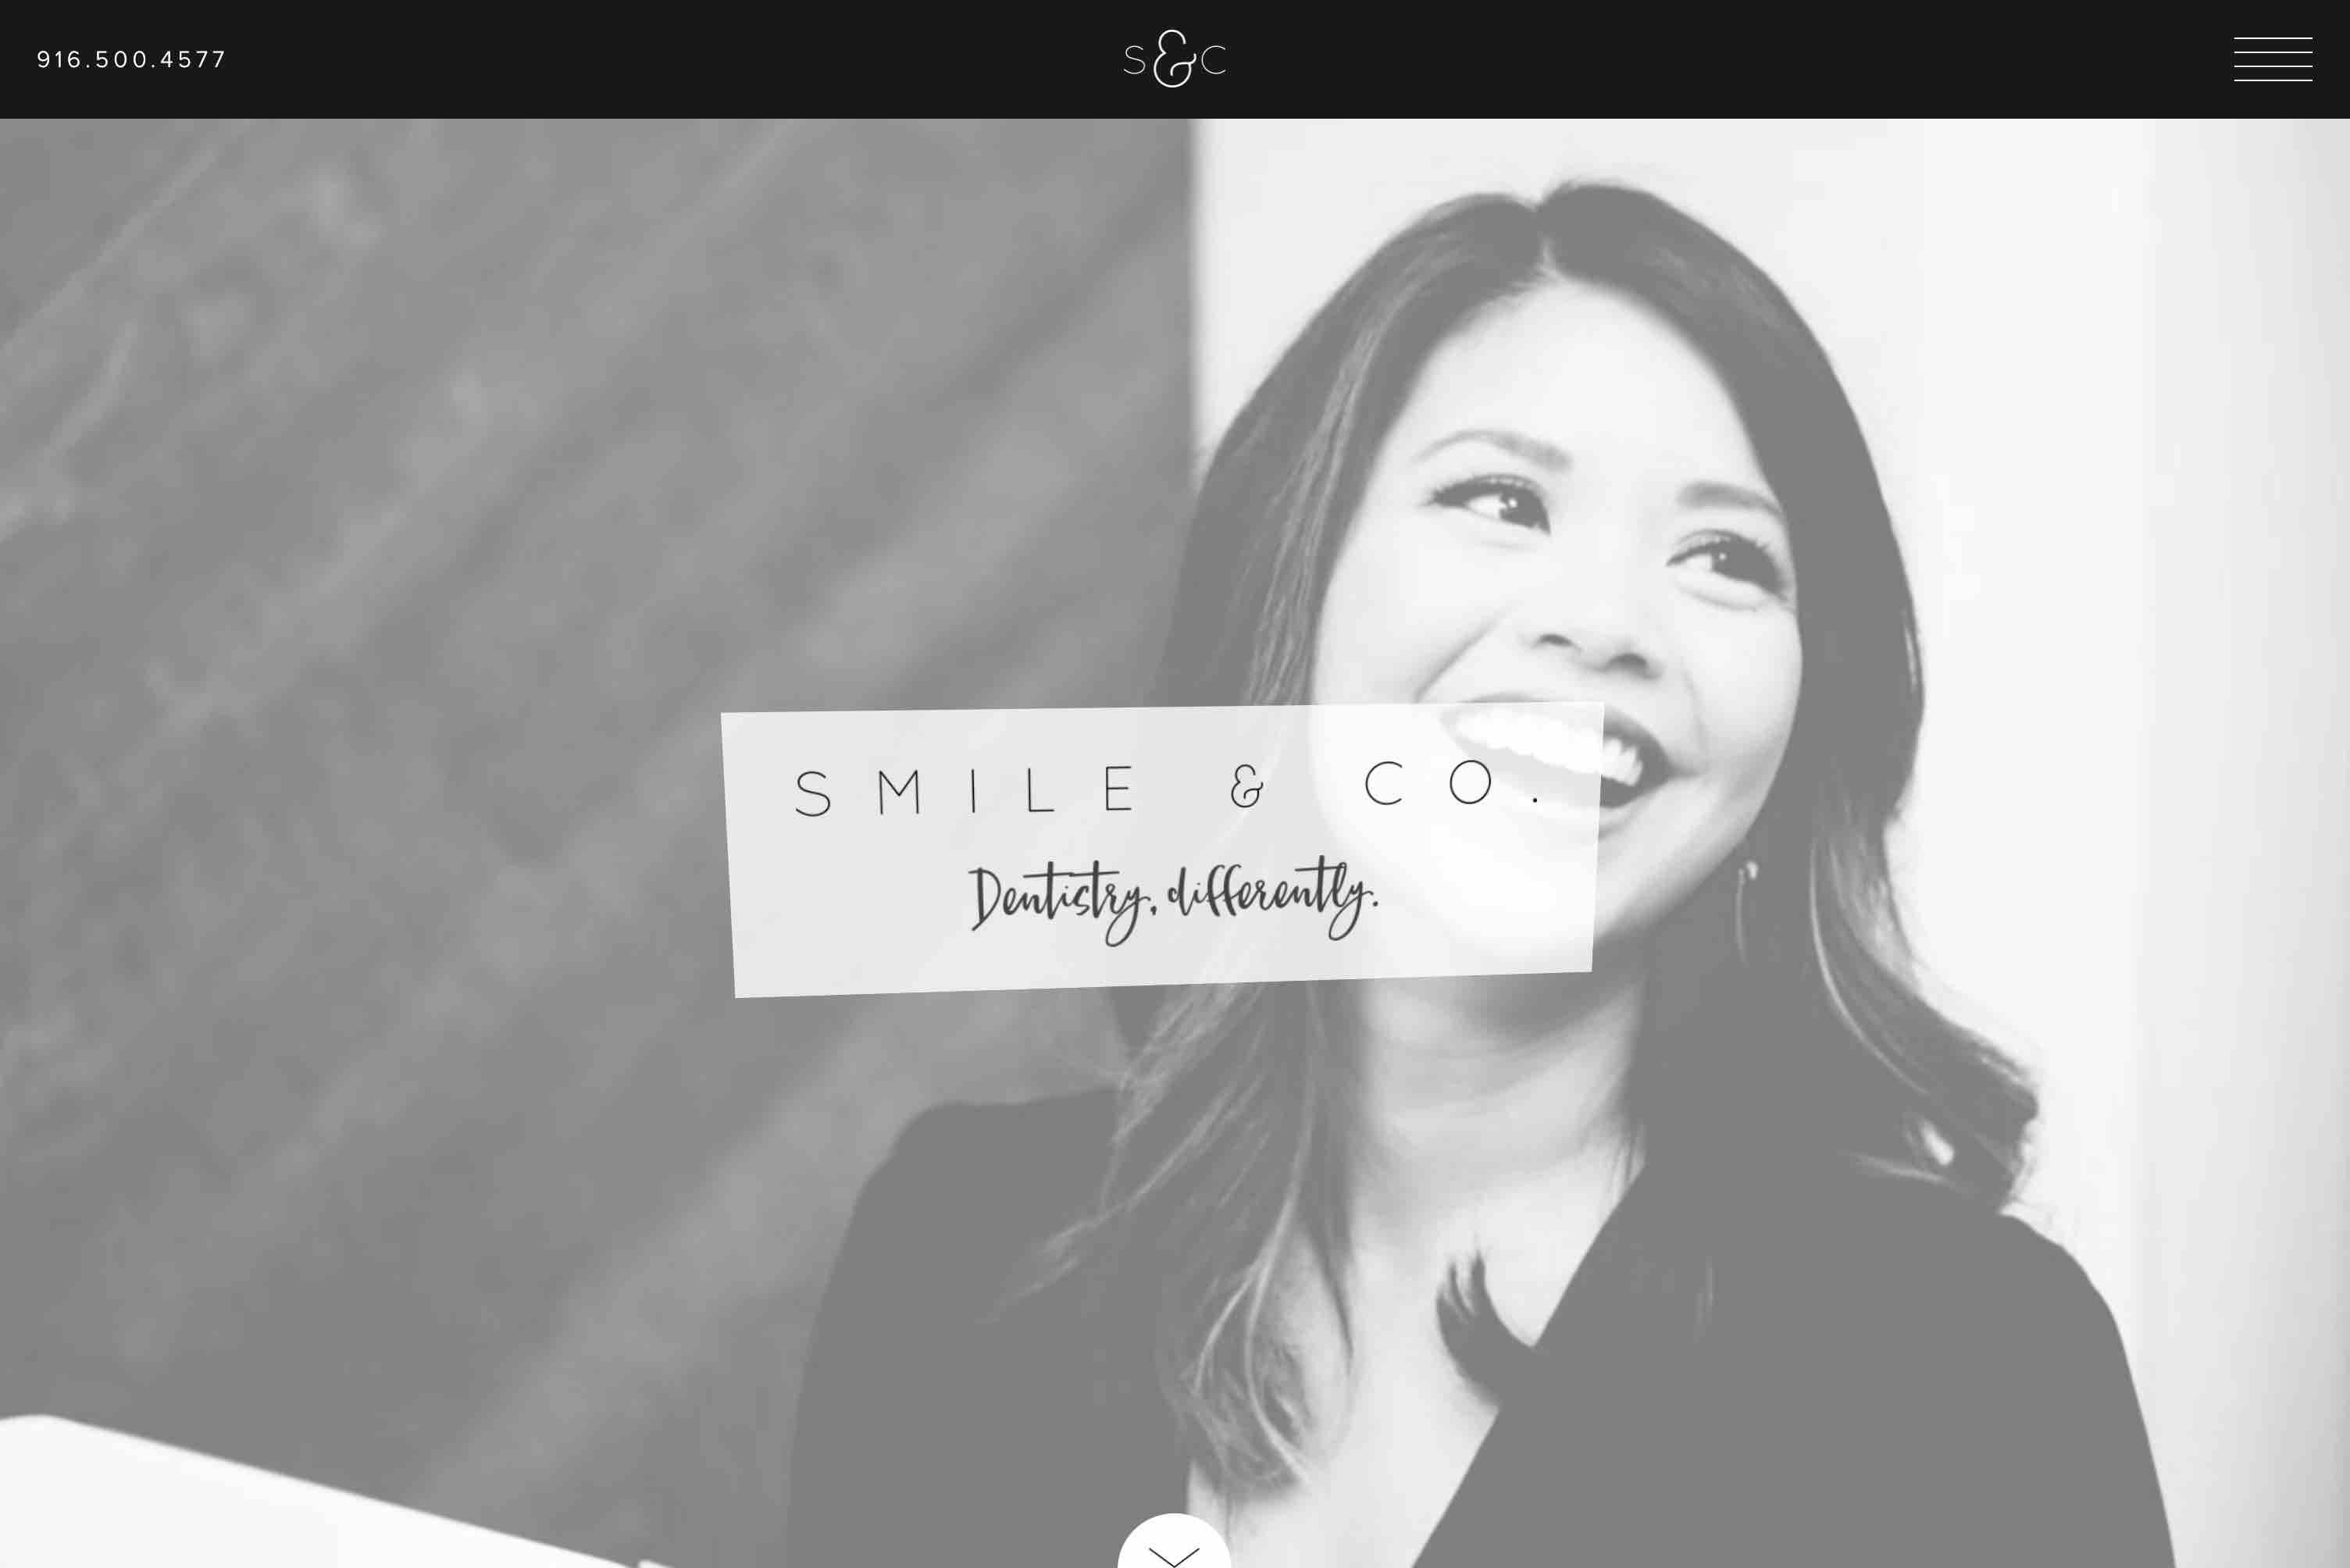 A screenshot of the Smile & Company website